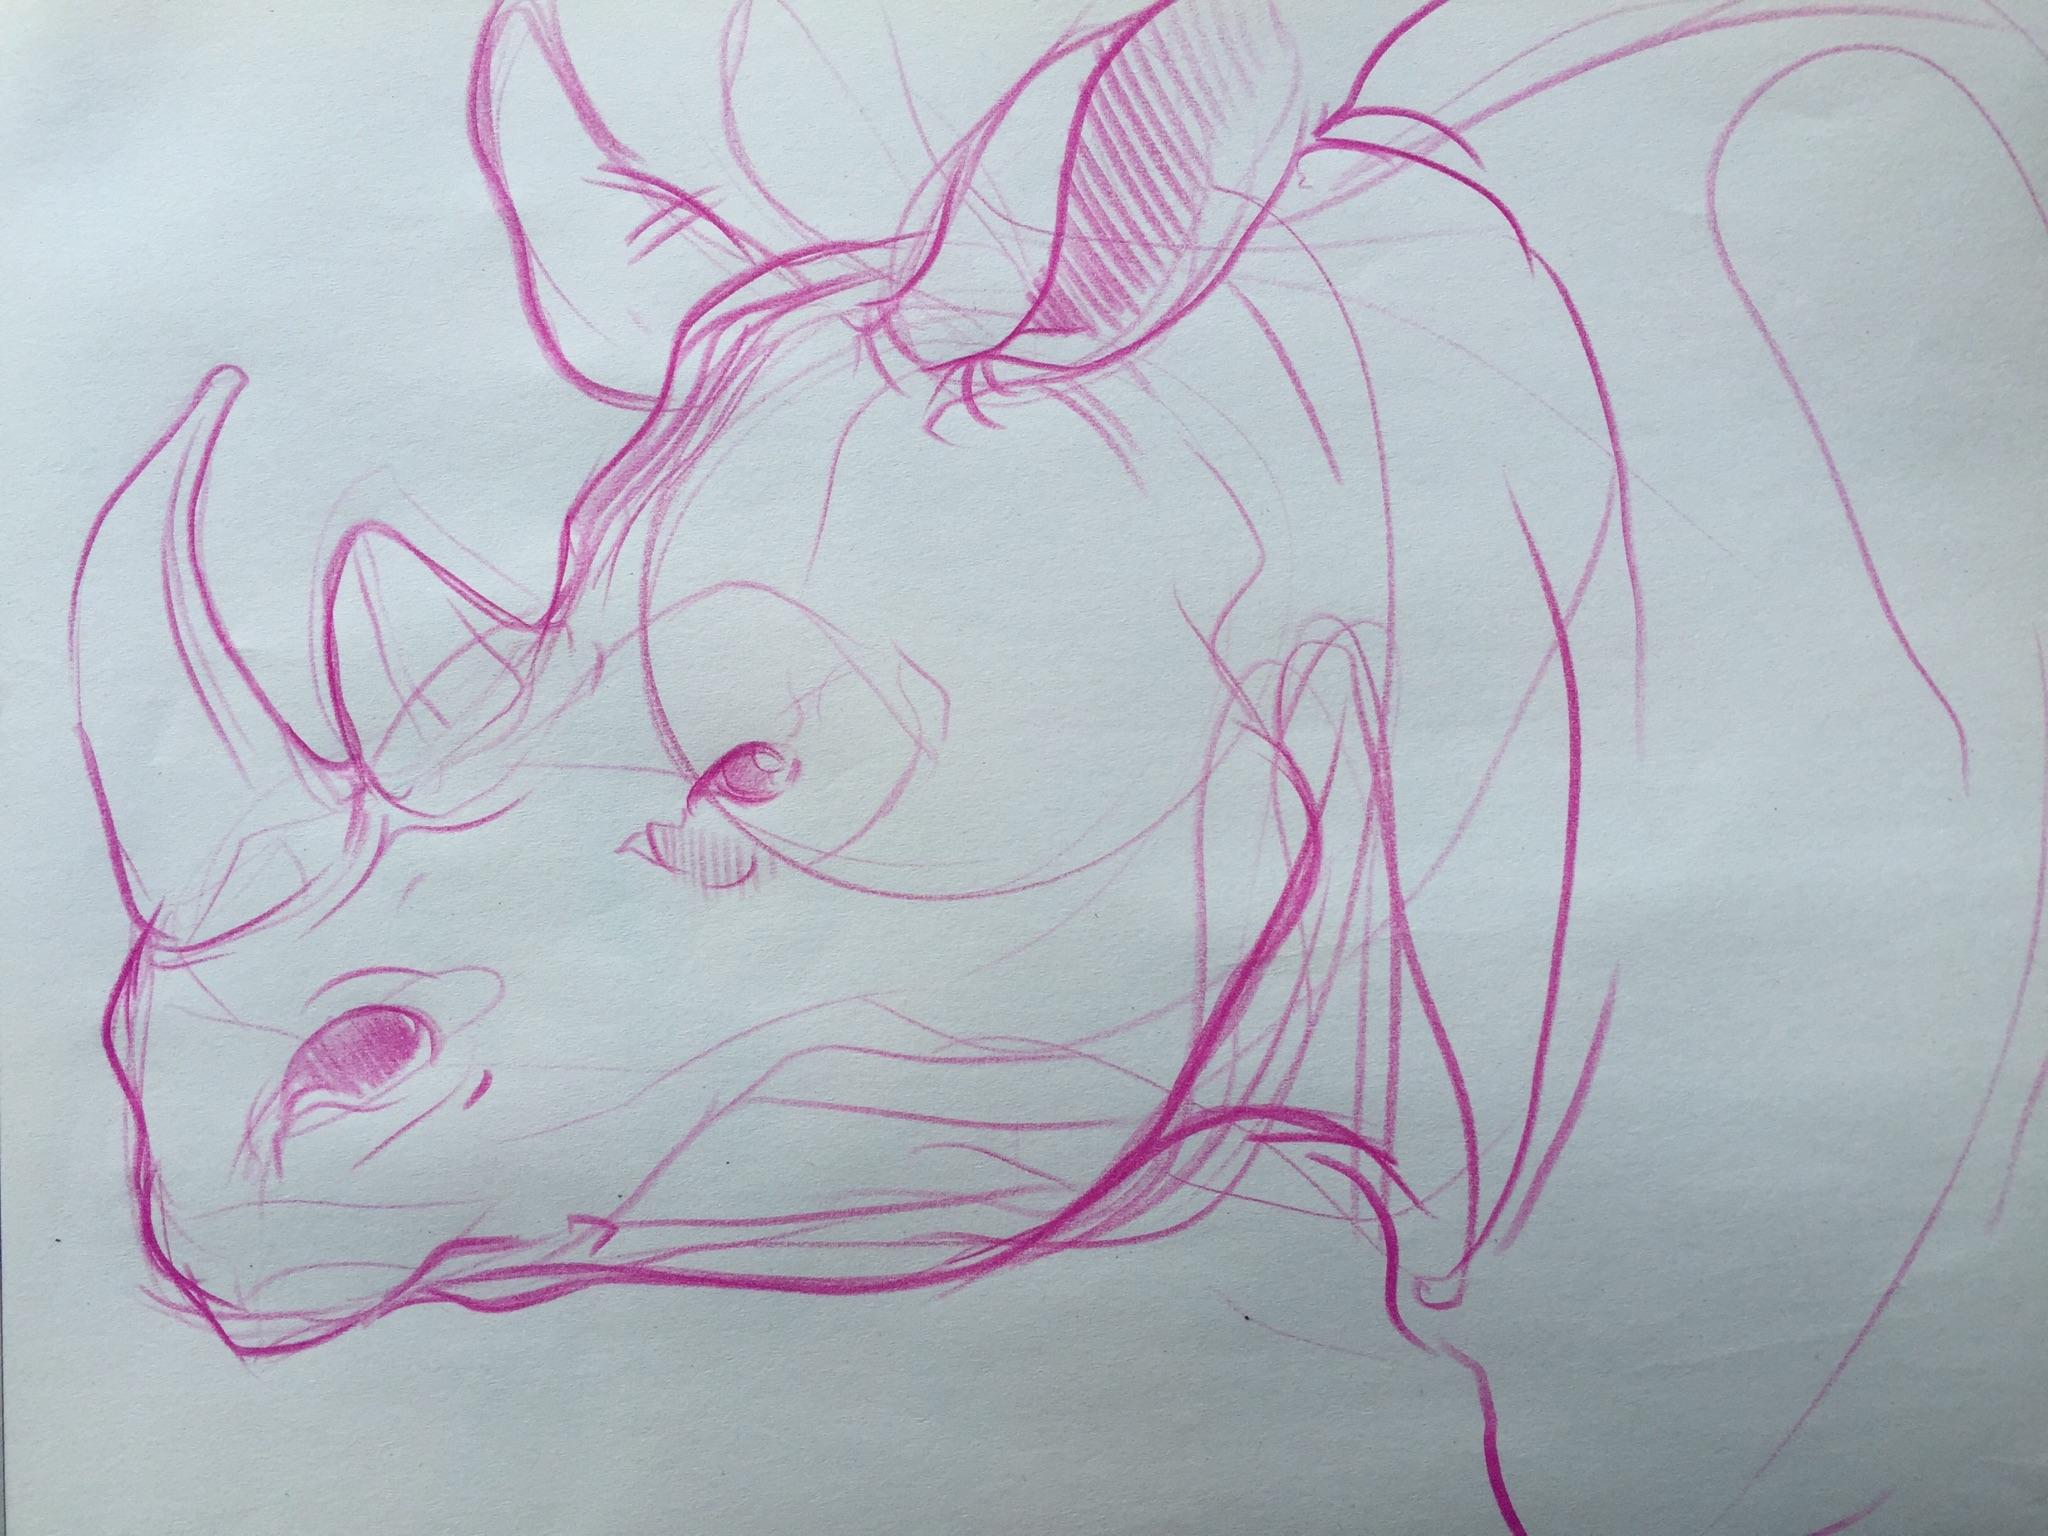 rhino sketch.jpg